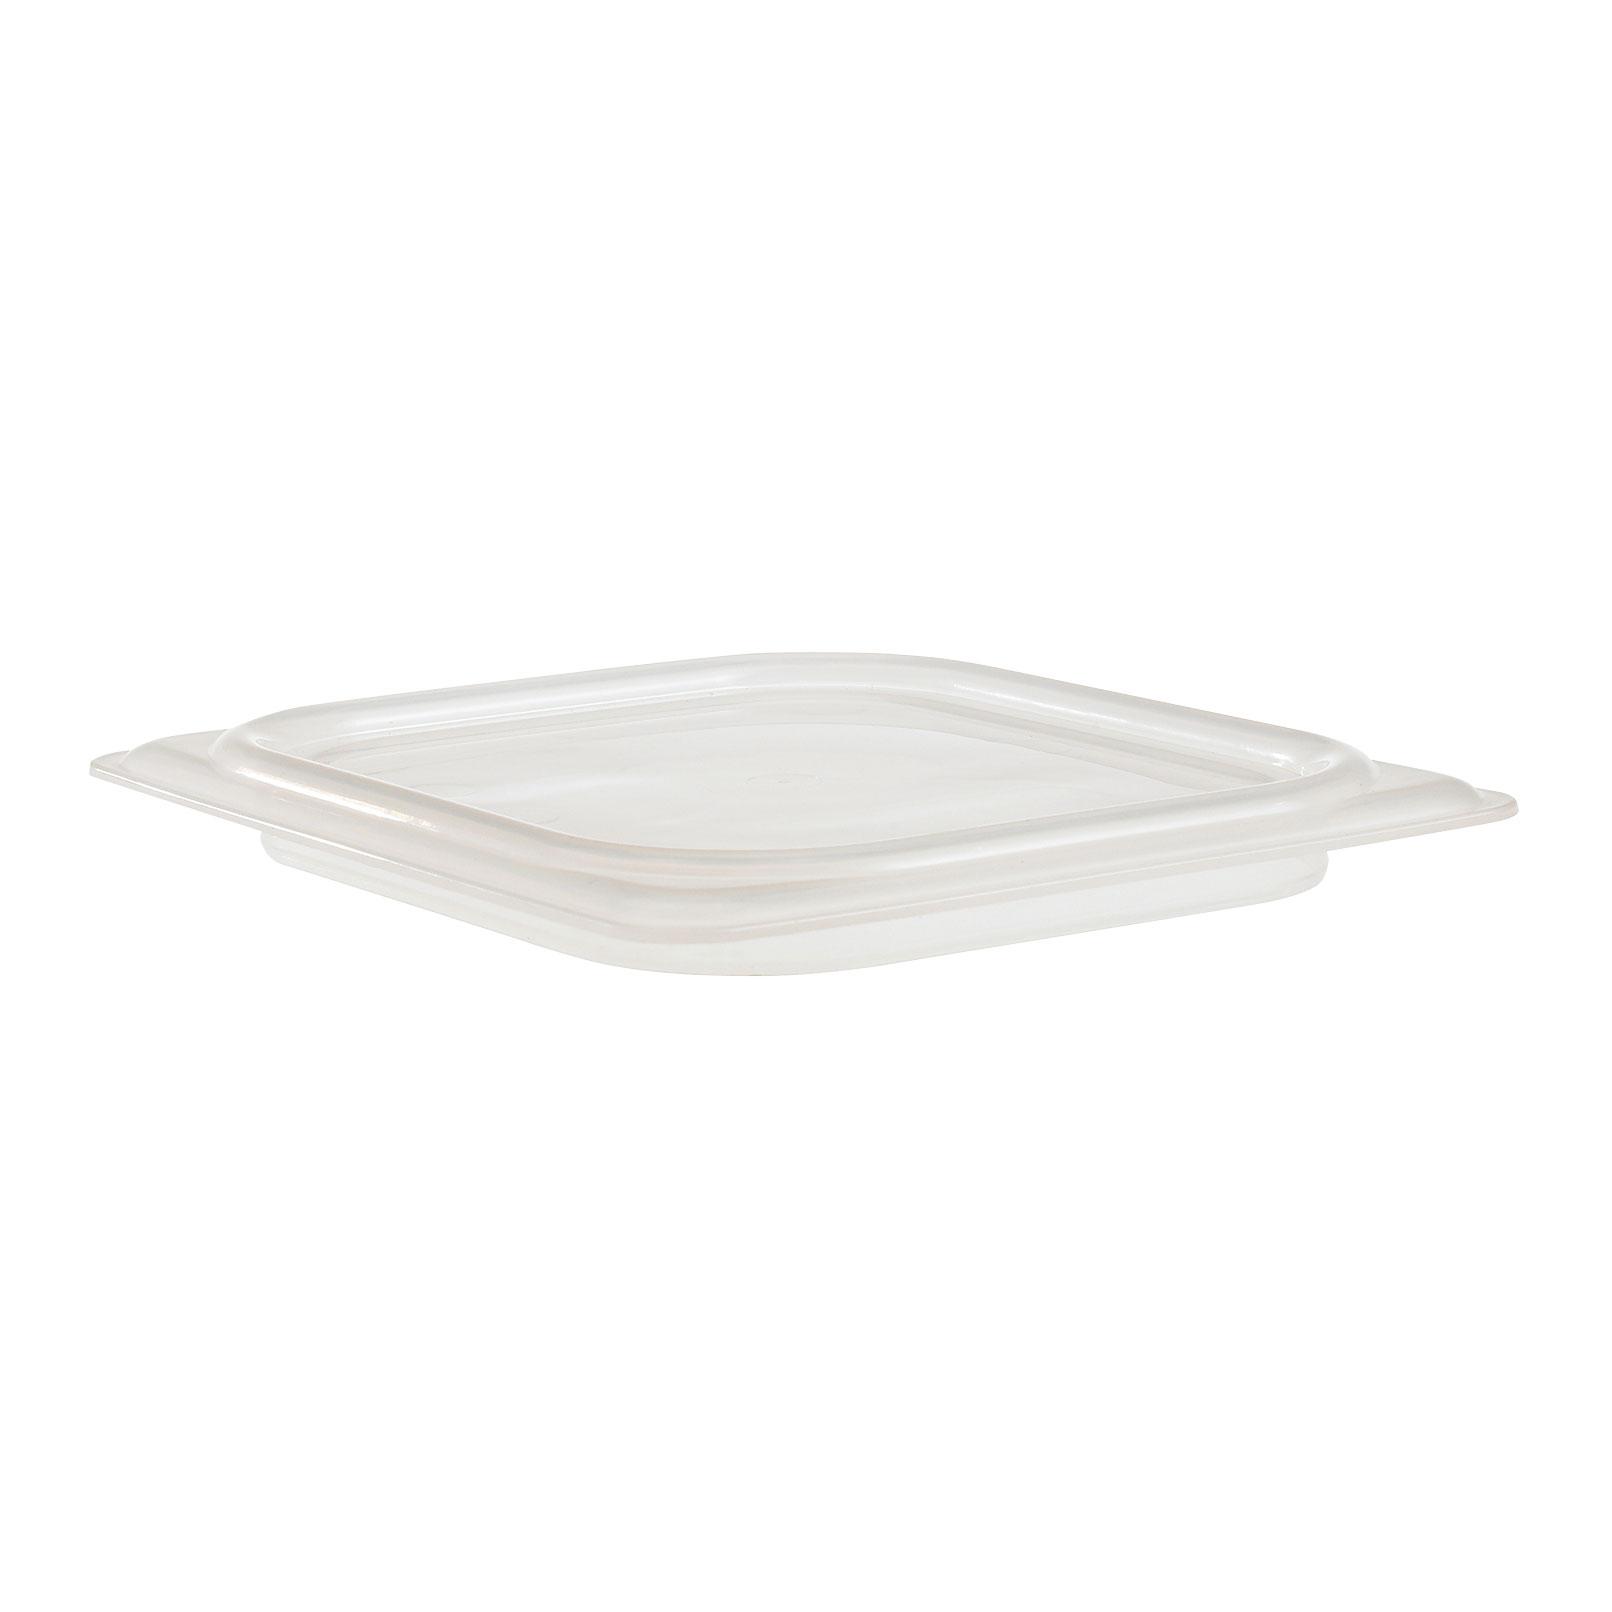 Cambro 60PPCWSC190 food pans